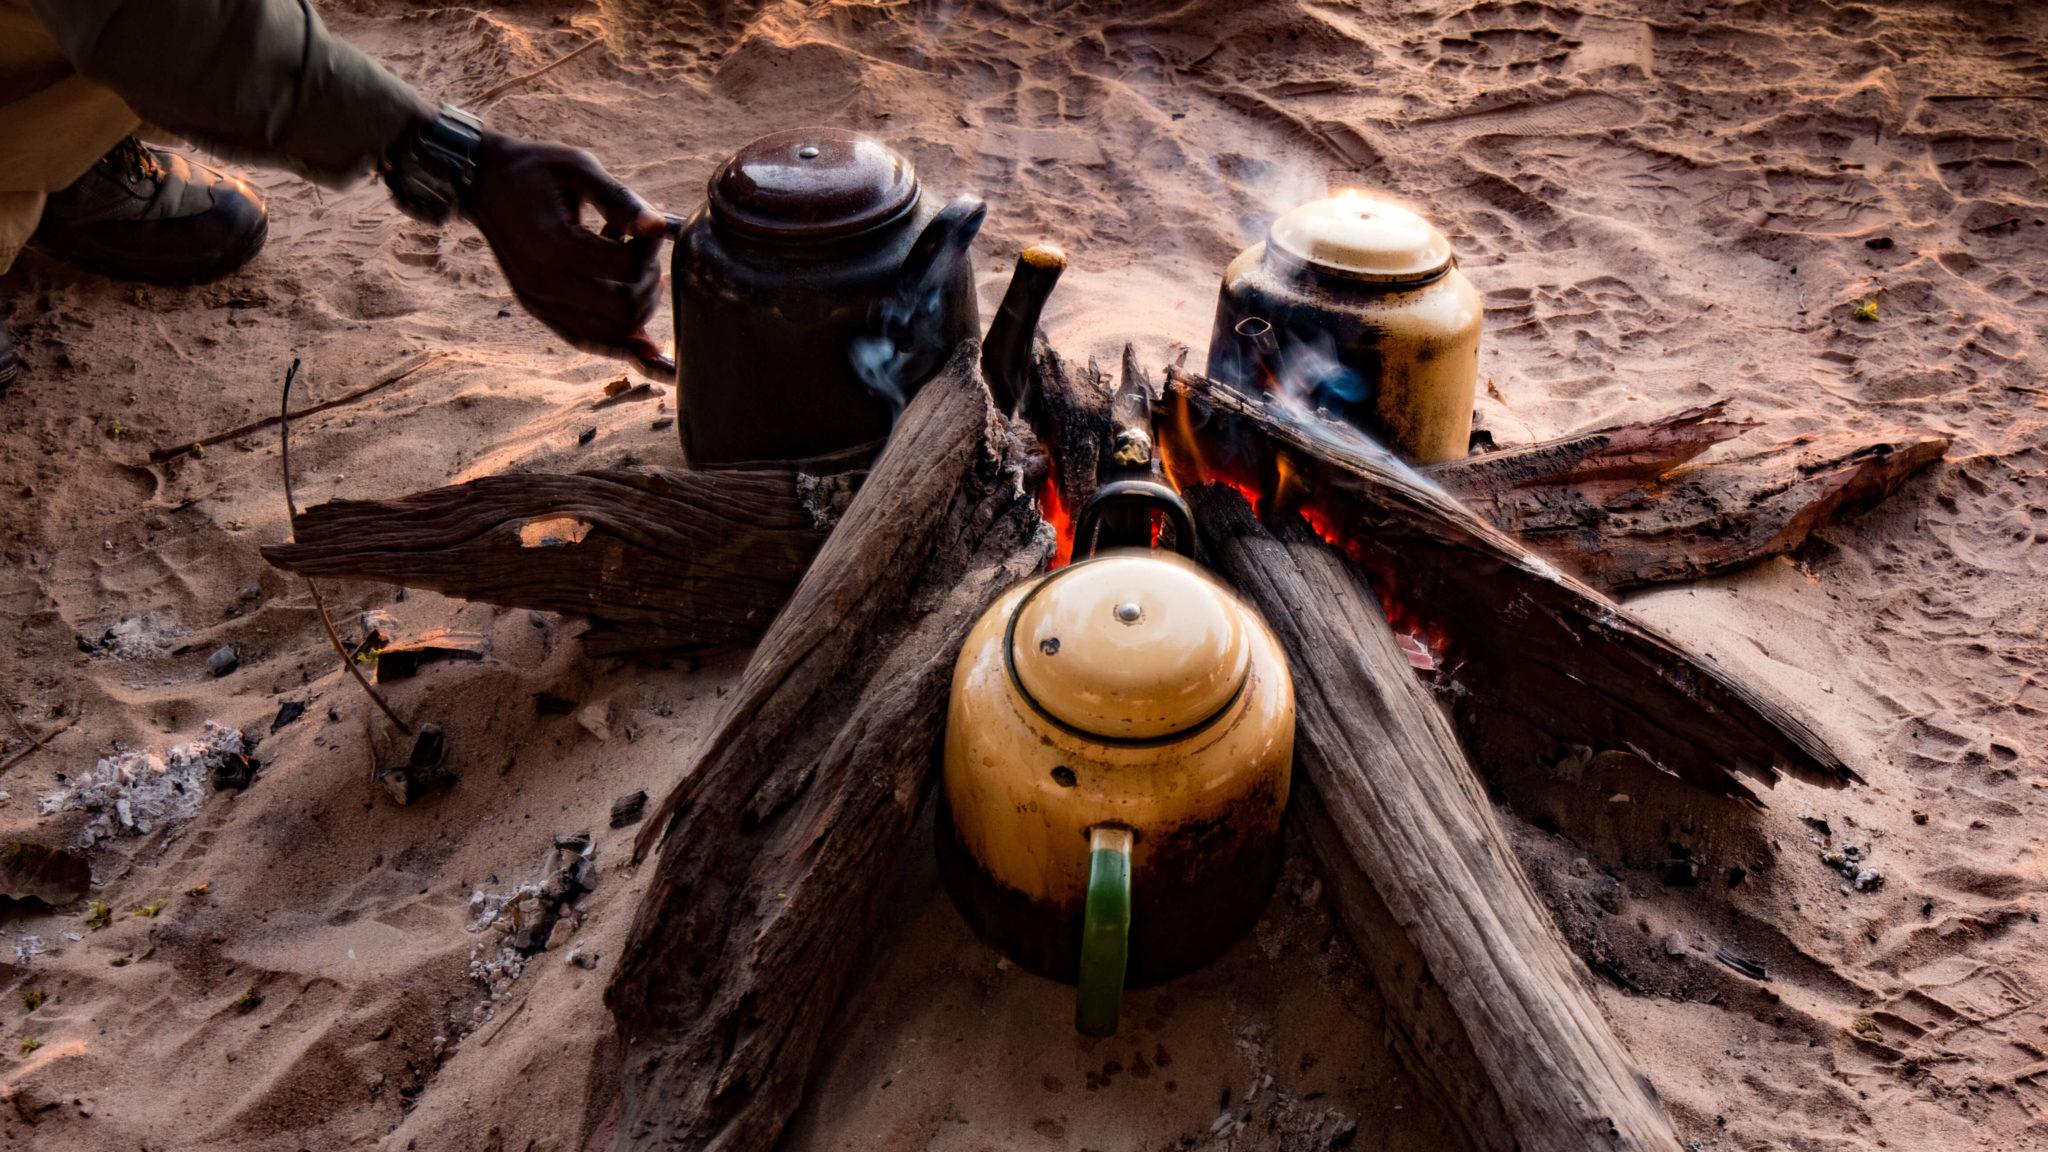 zambia luangwa valley campfire coffee